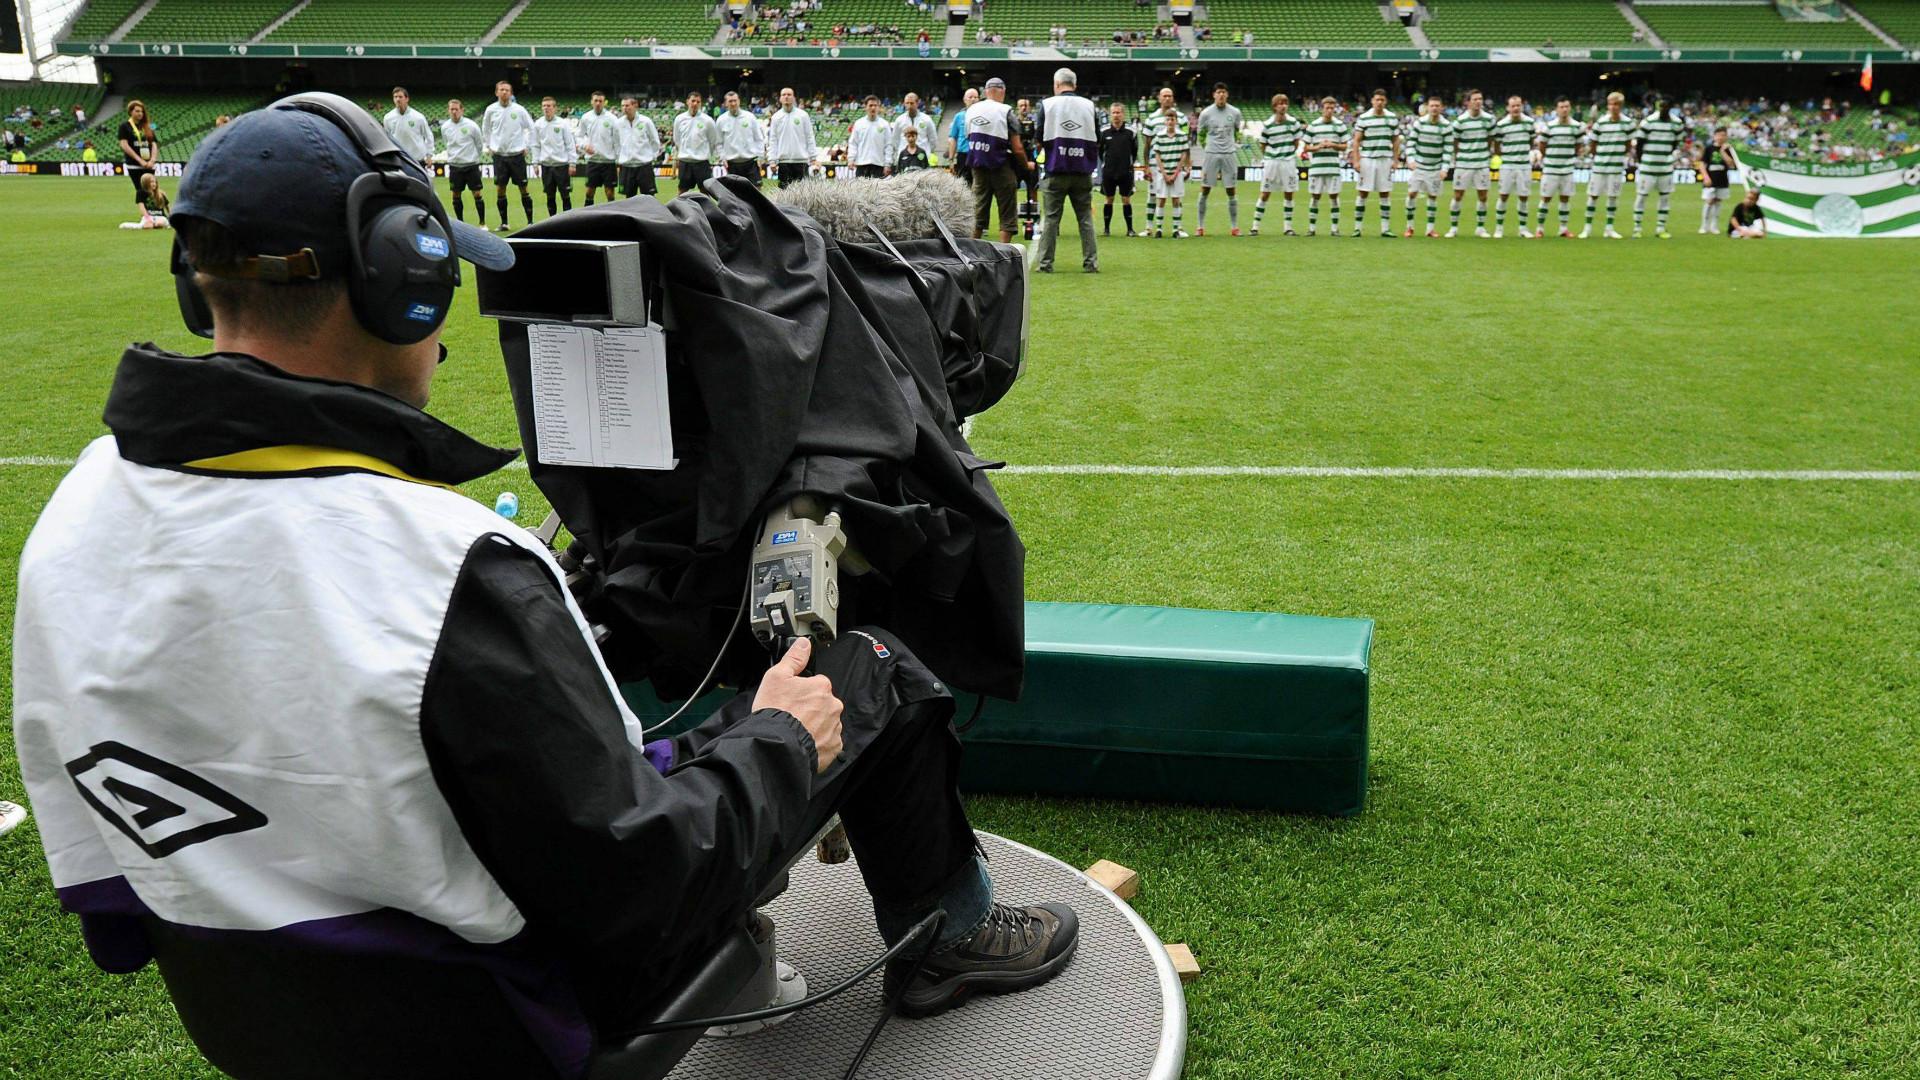 Champions League, al via l'asta per i diritti